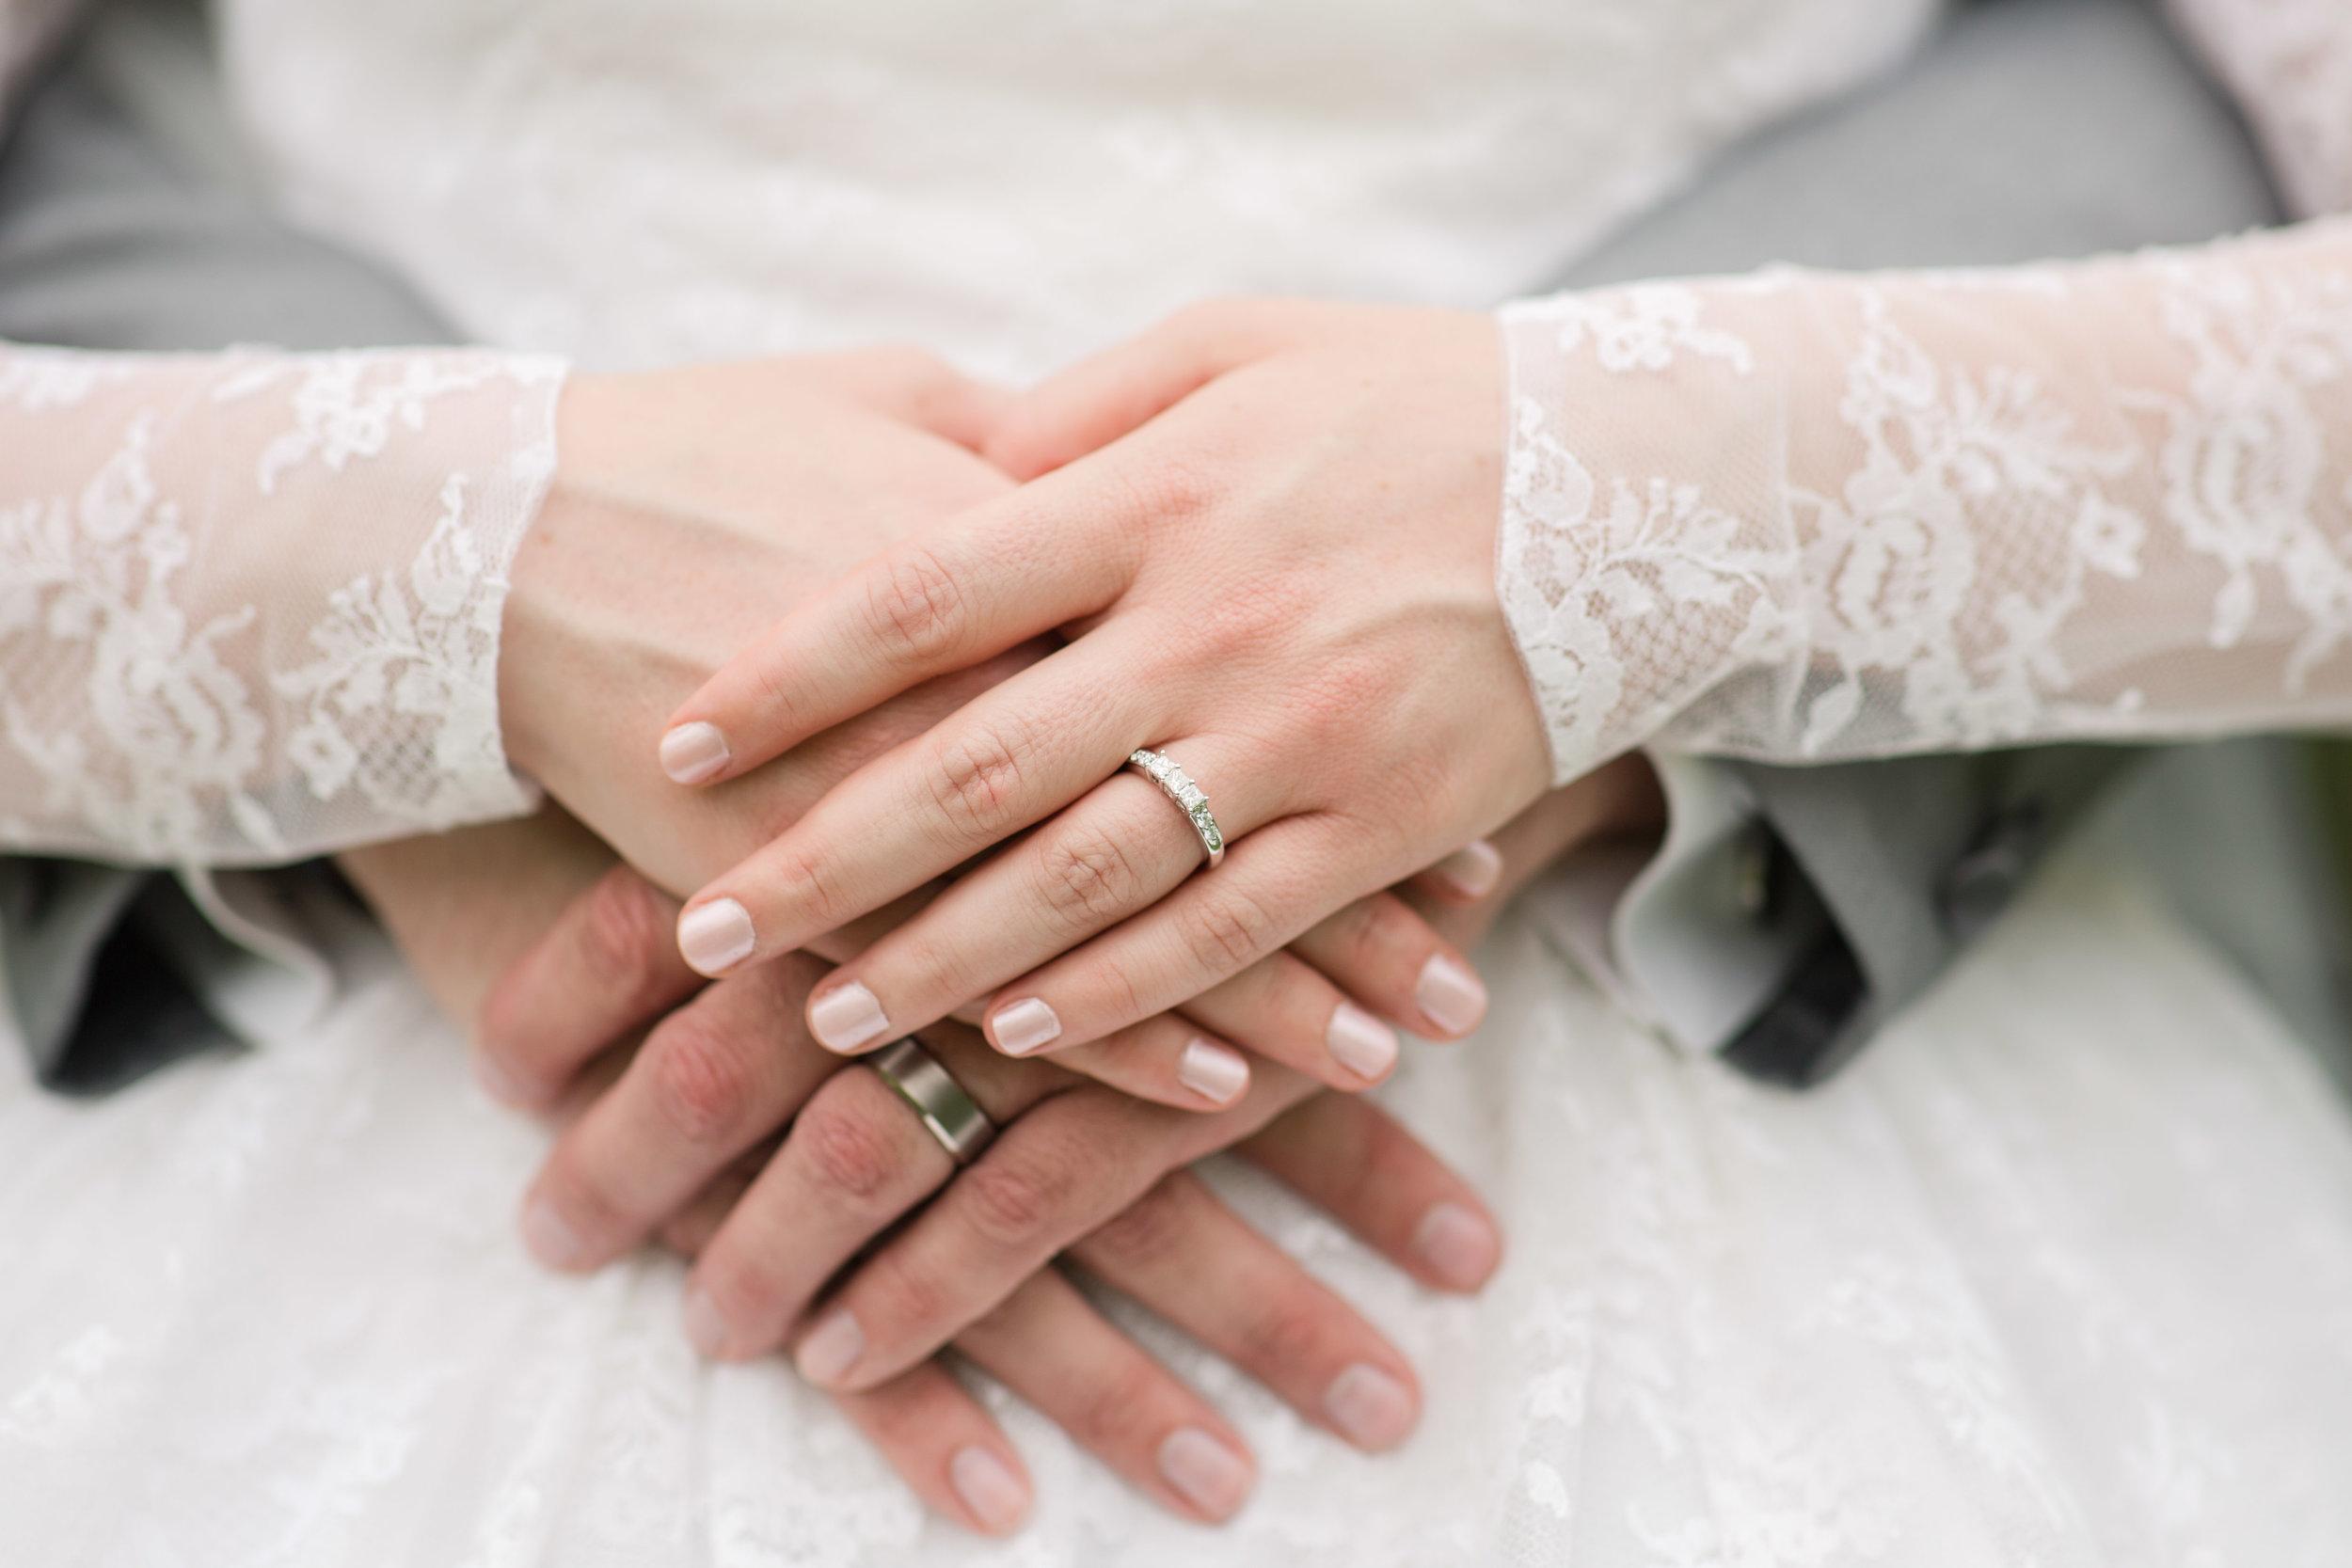 wedding rings on hands